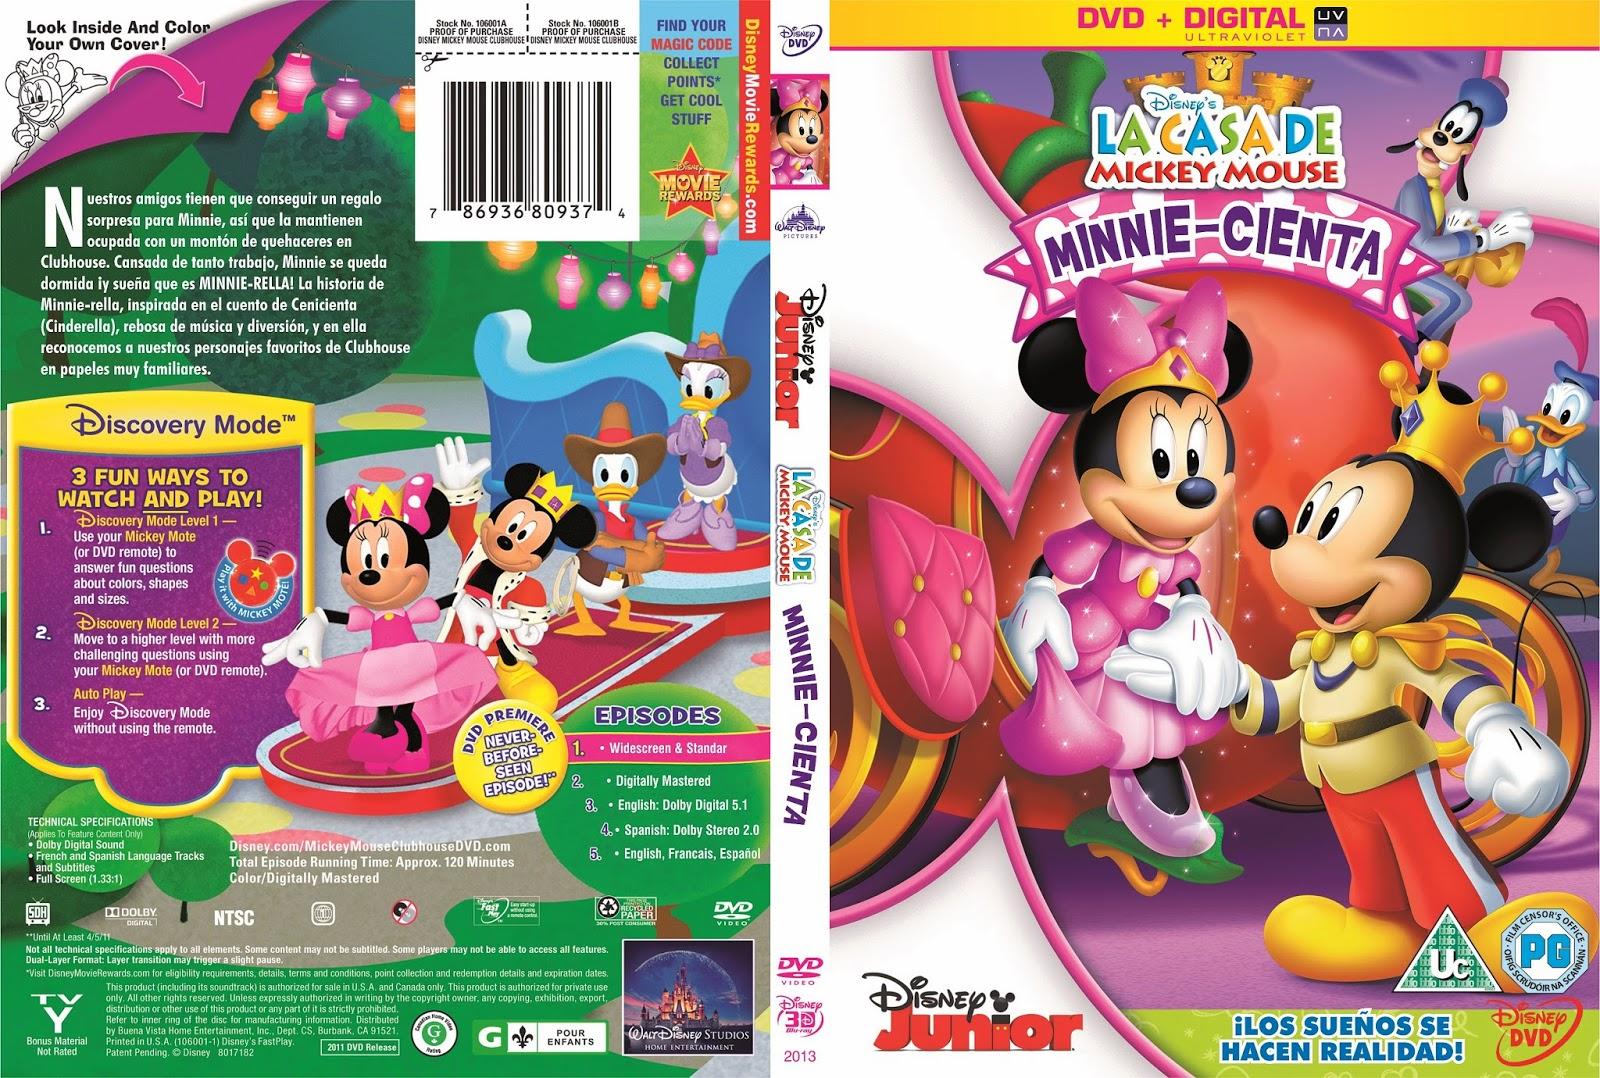 Movies world la casa de mickey mouse minnie cienta dvd - Mickey mouse minnie cienta ...